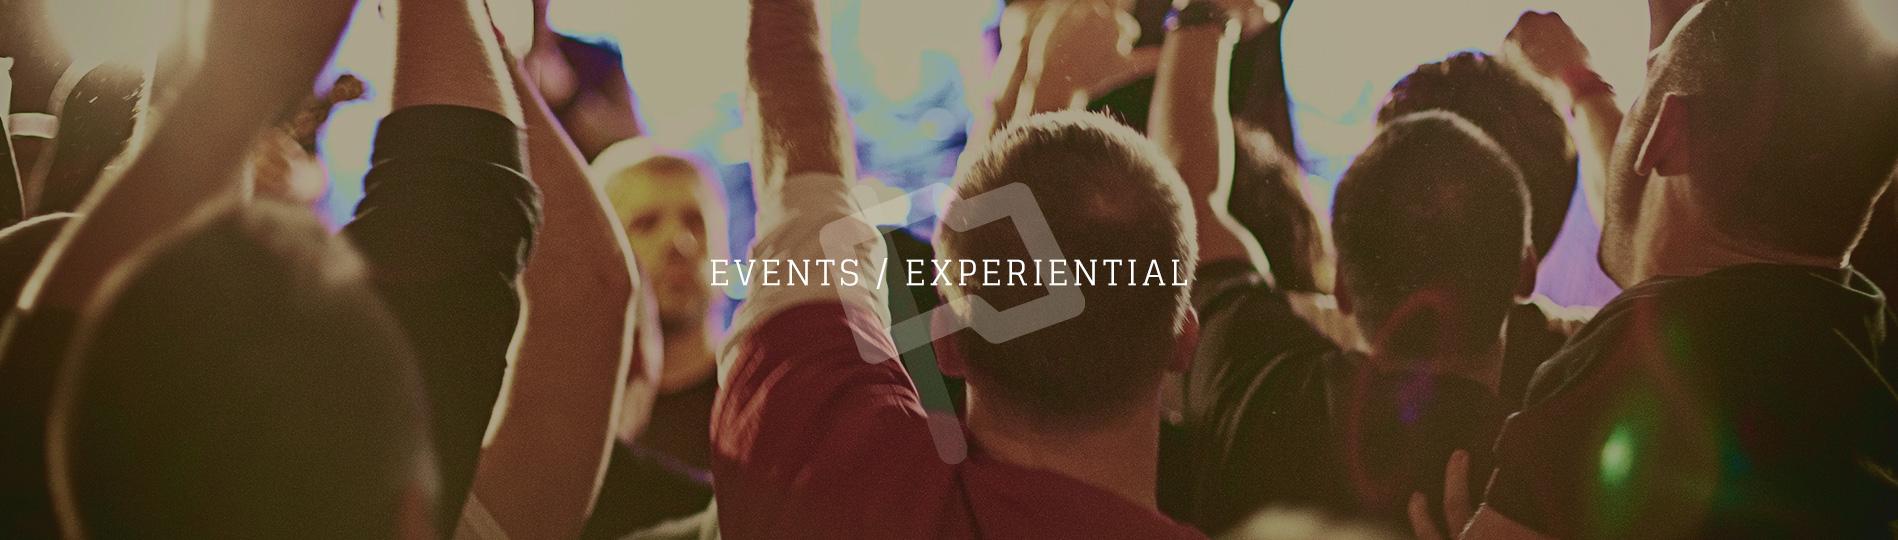 Capabilities_Experiential-Events.jpg